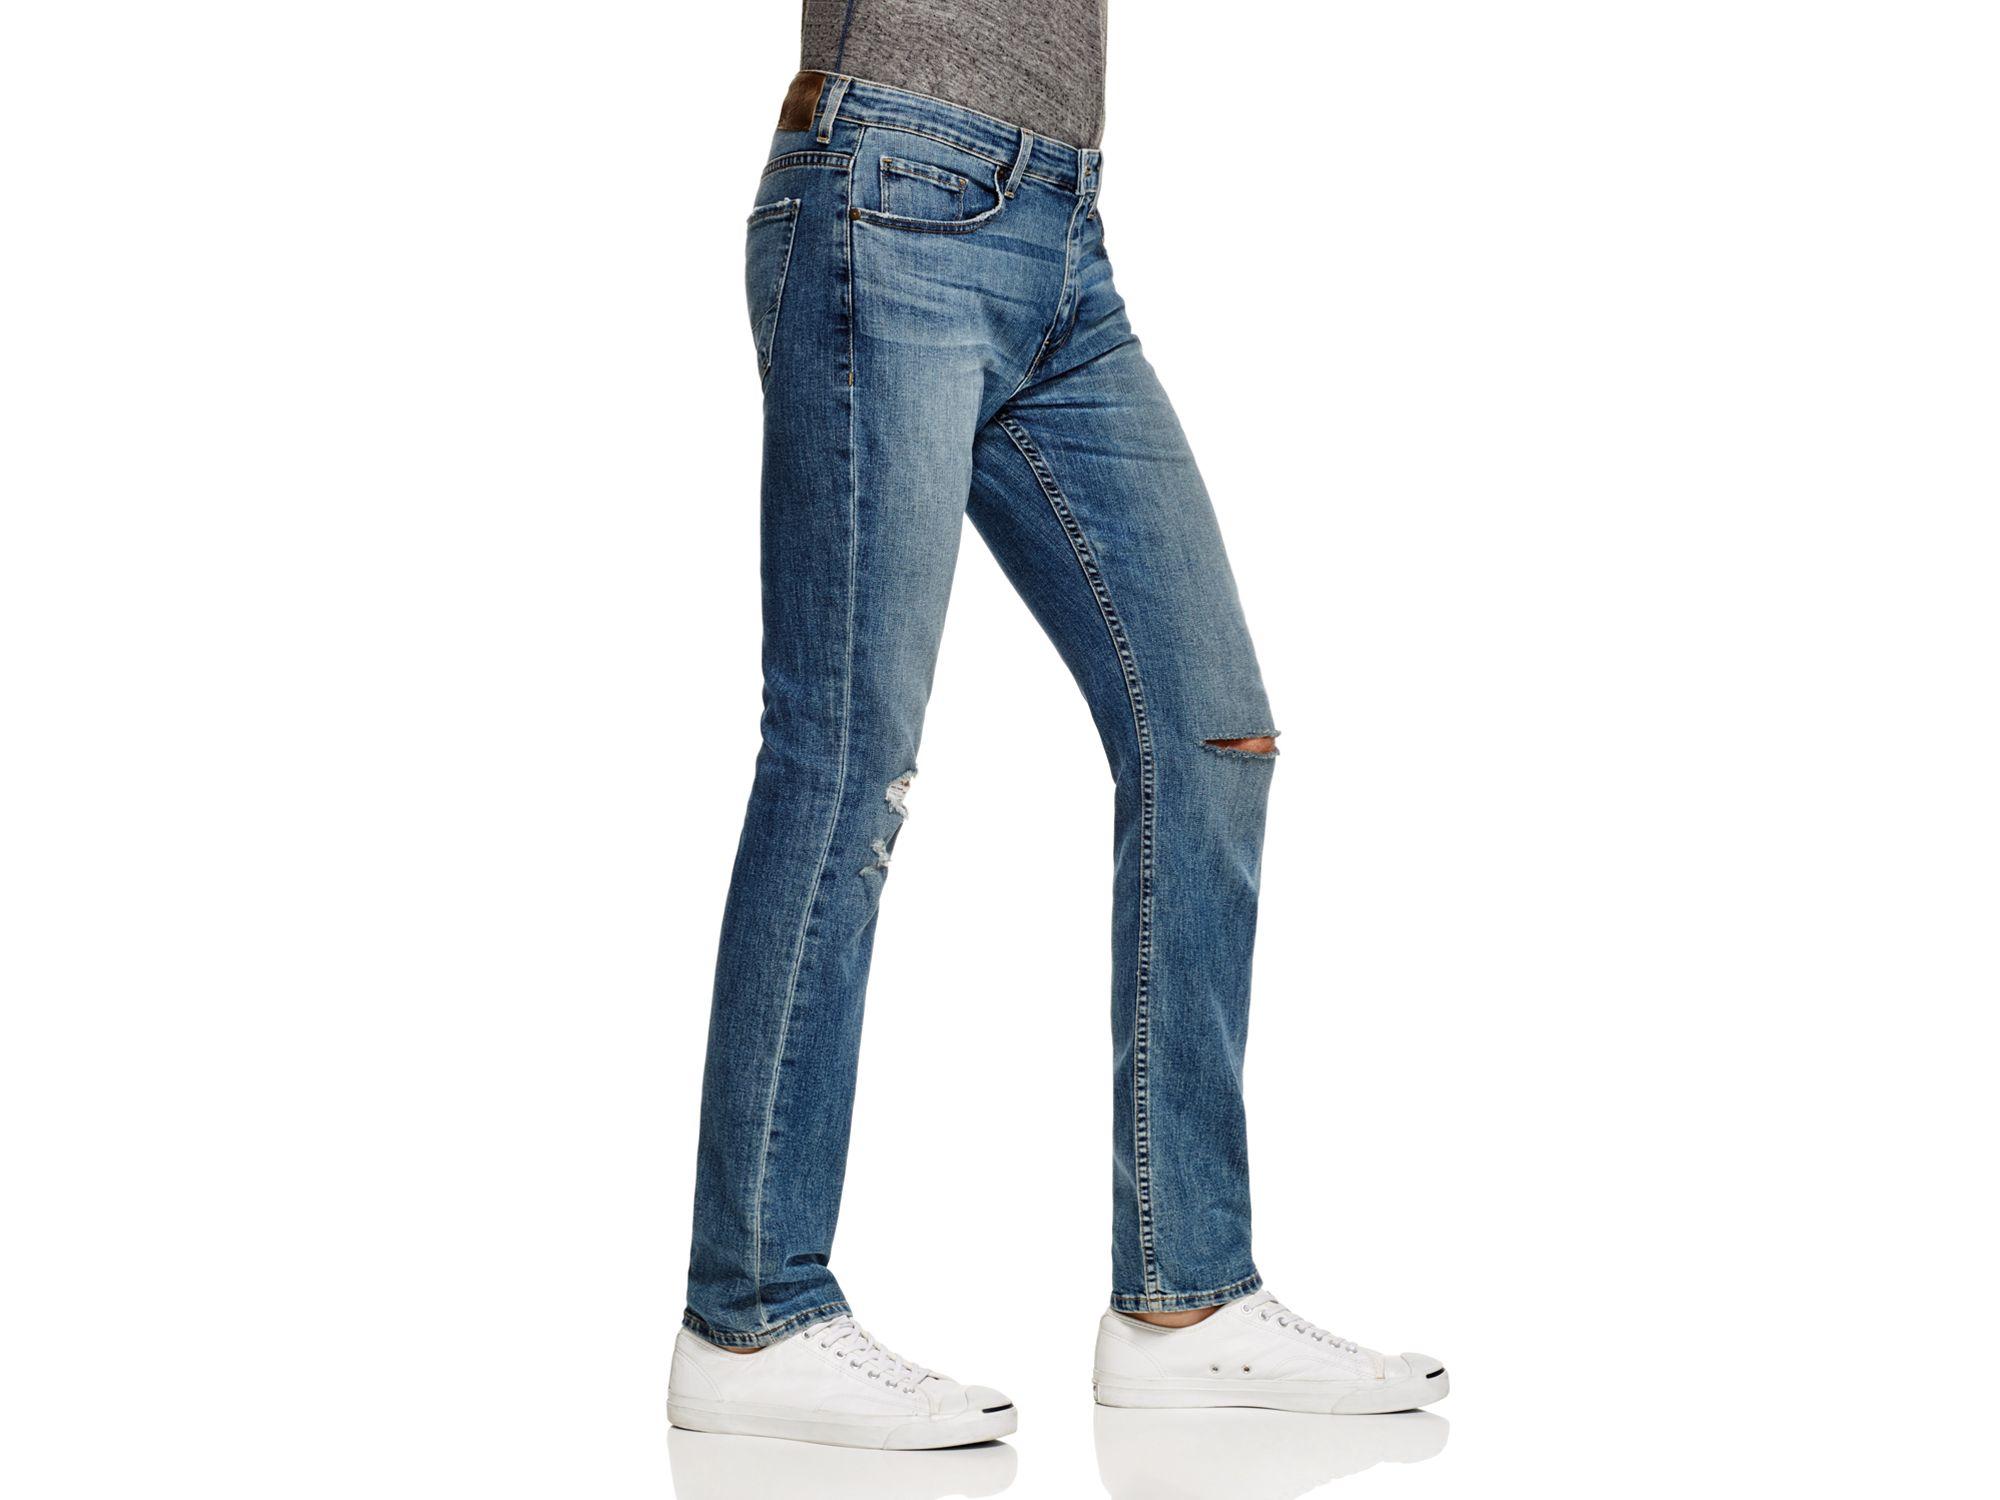 PAIGE Federal Slim Fit Jeans In Sanford in Blue for Men